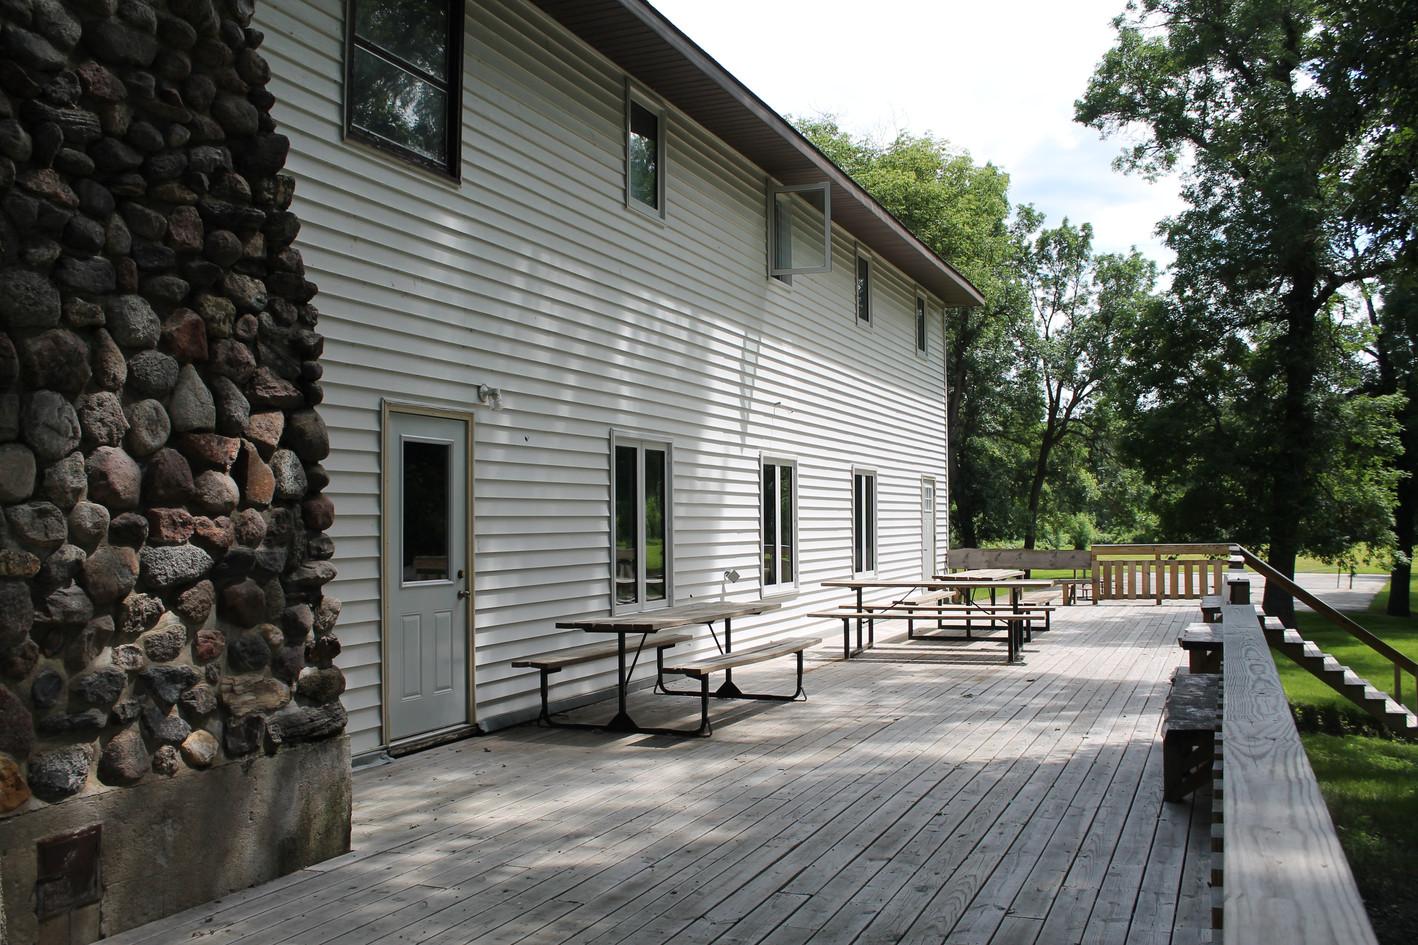 The Lodge - Backside